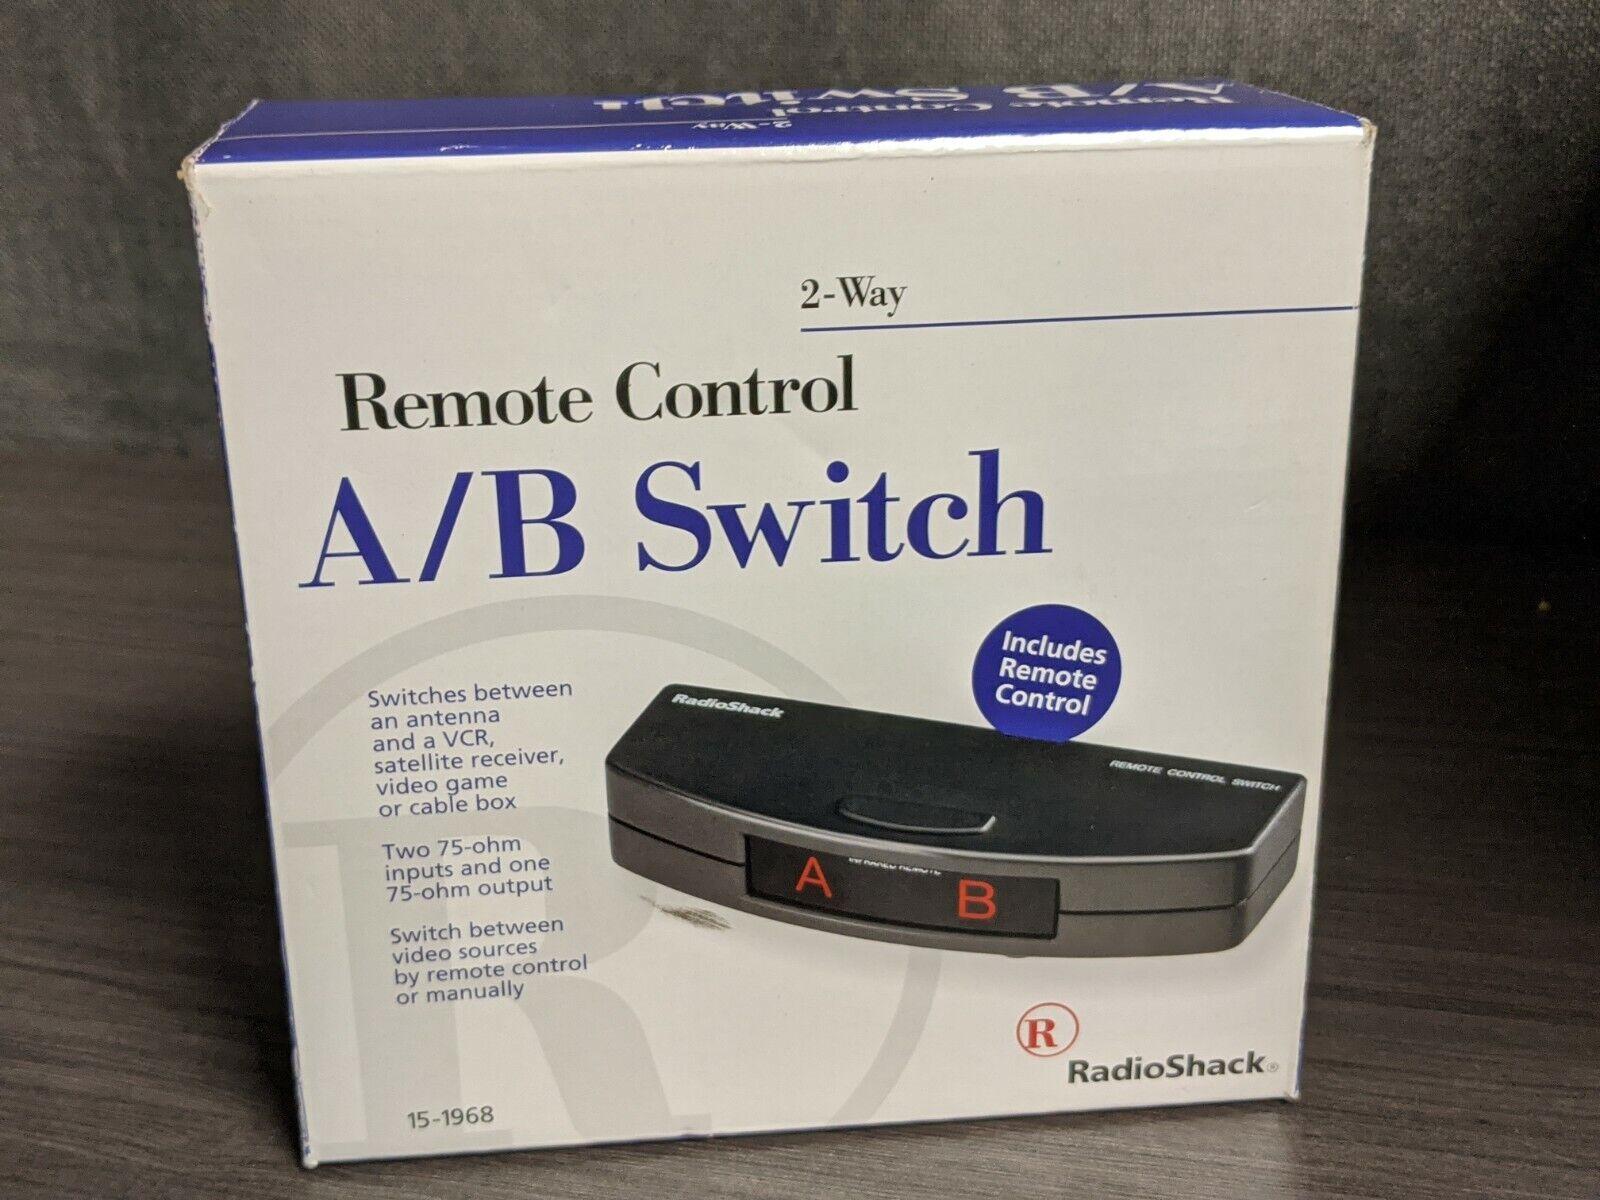 New - Radio Shack Remote Control A/B Switch 2 Way Video Source Switcher 15-1968 - $76.00